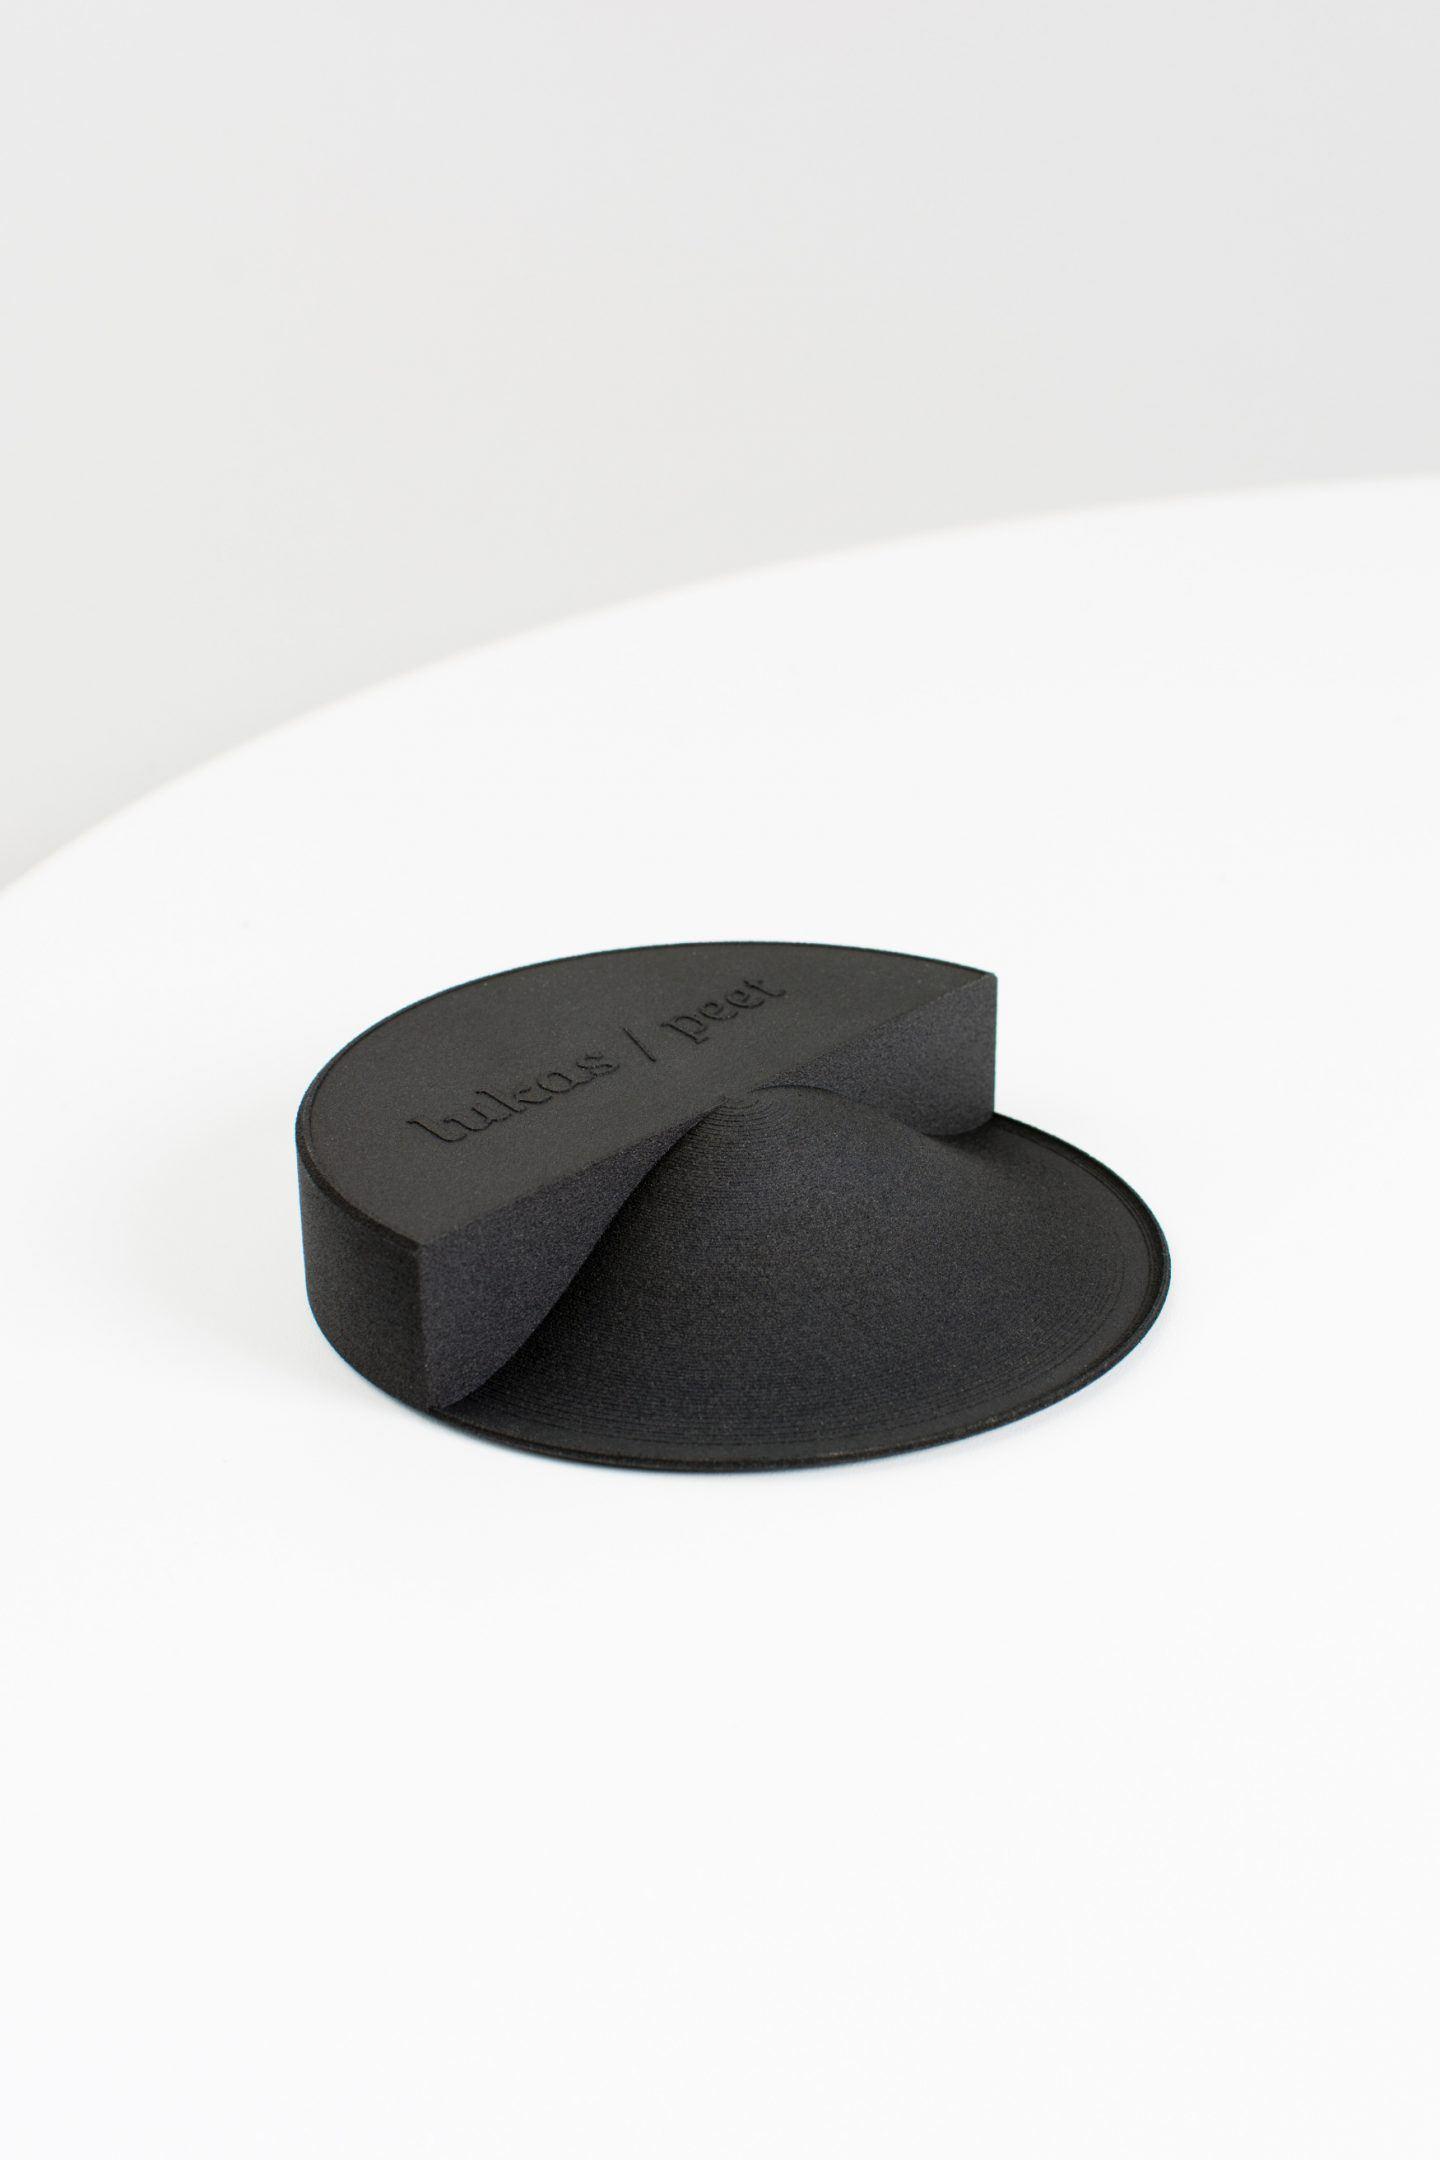 iGNANT-Design-Lukas-Peet-Scent-Tray-012